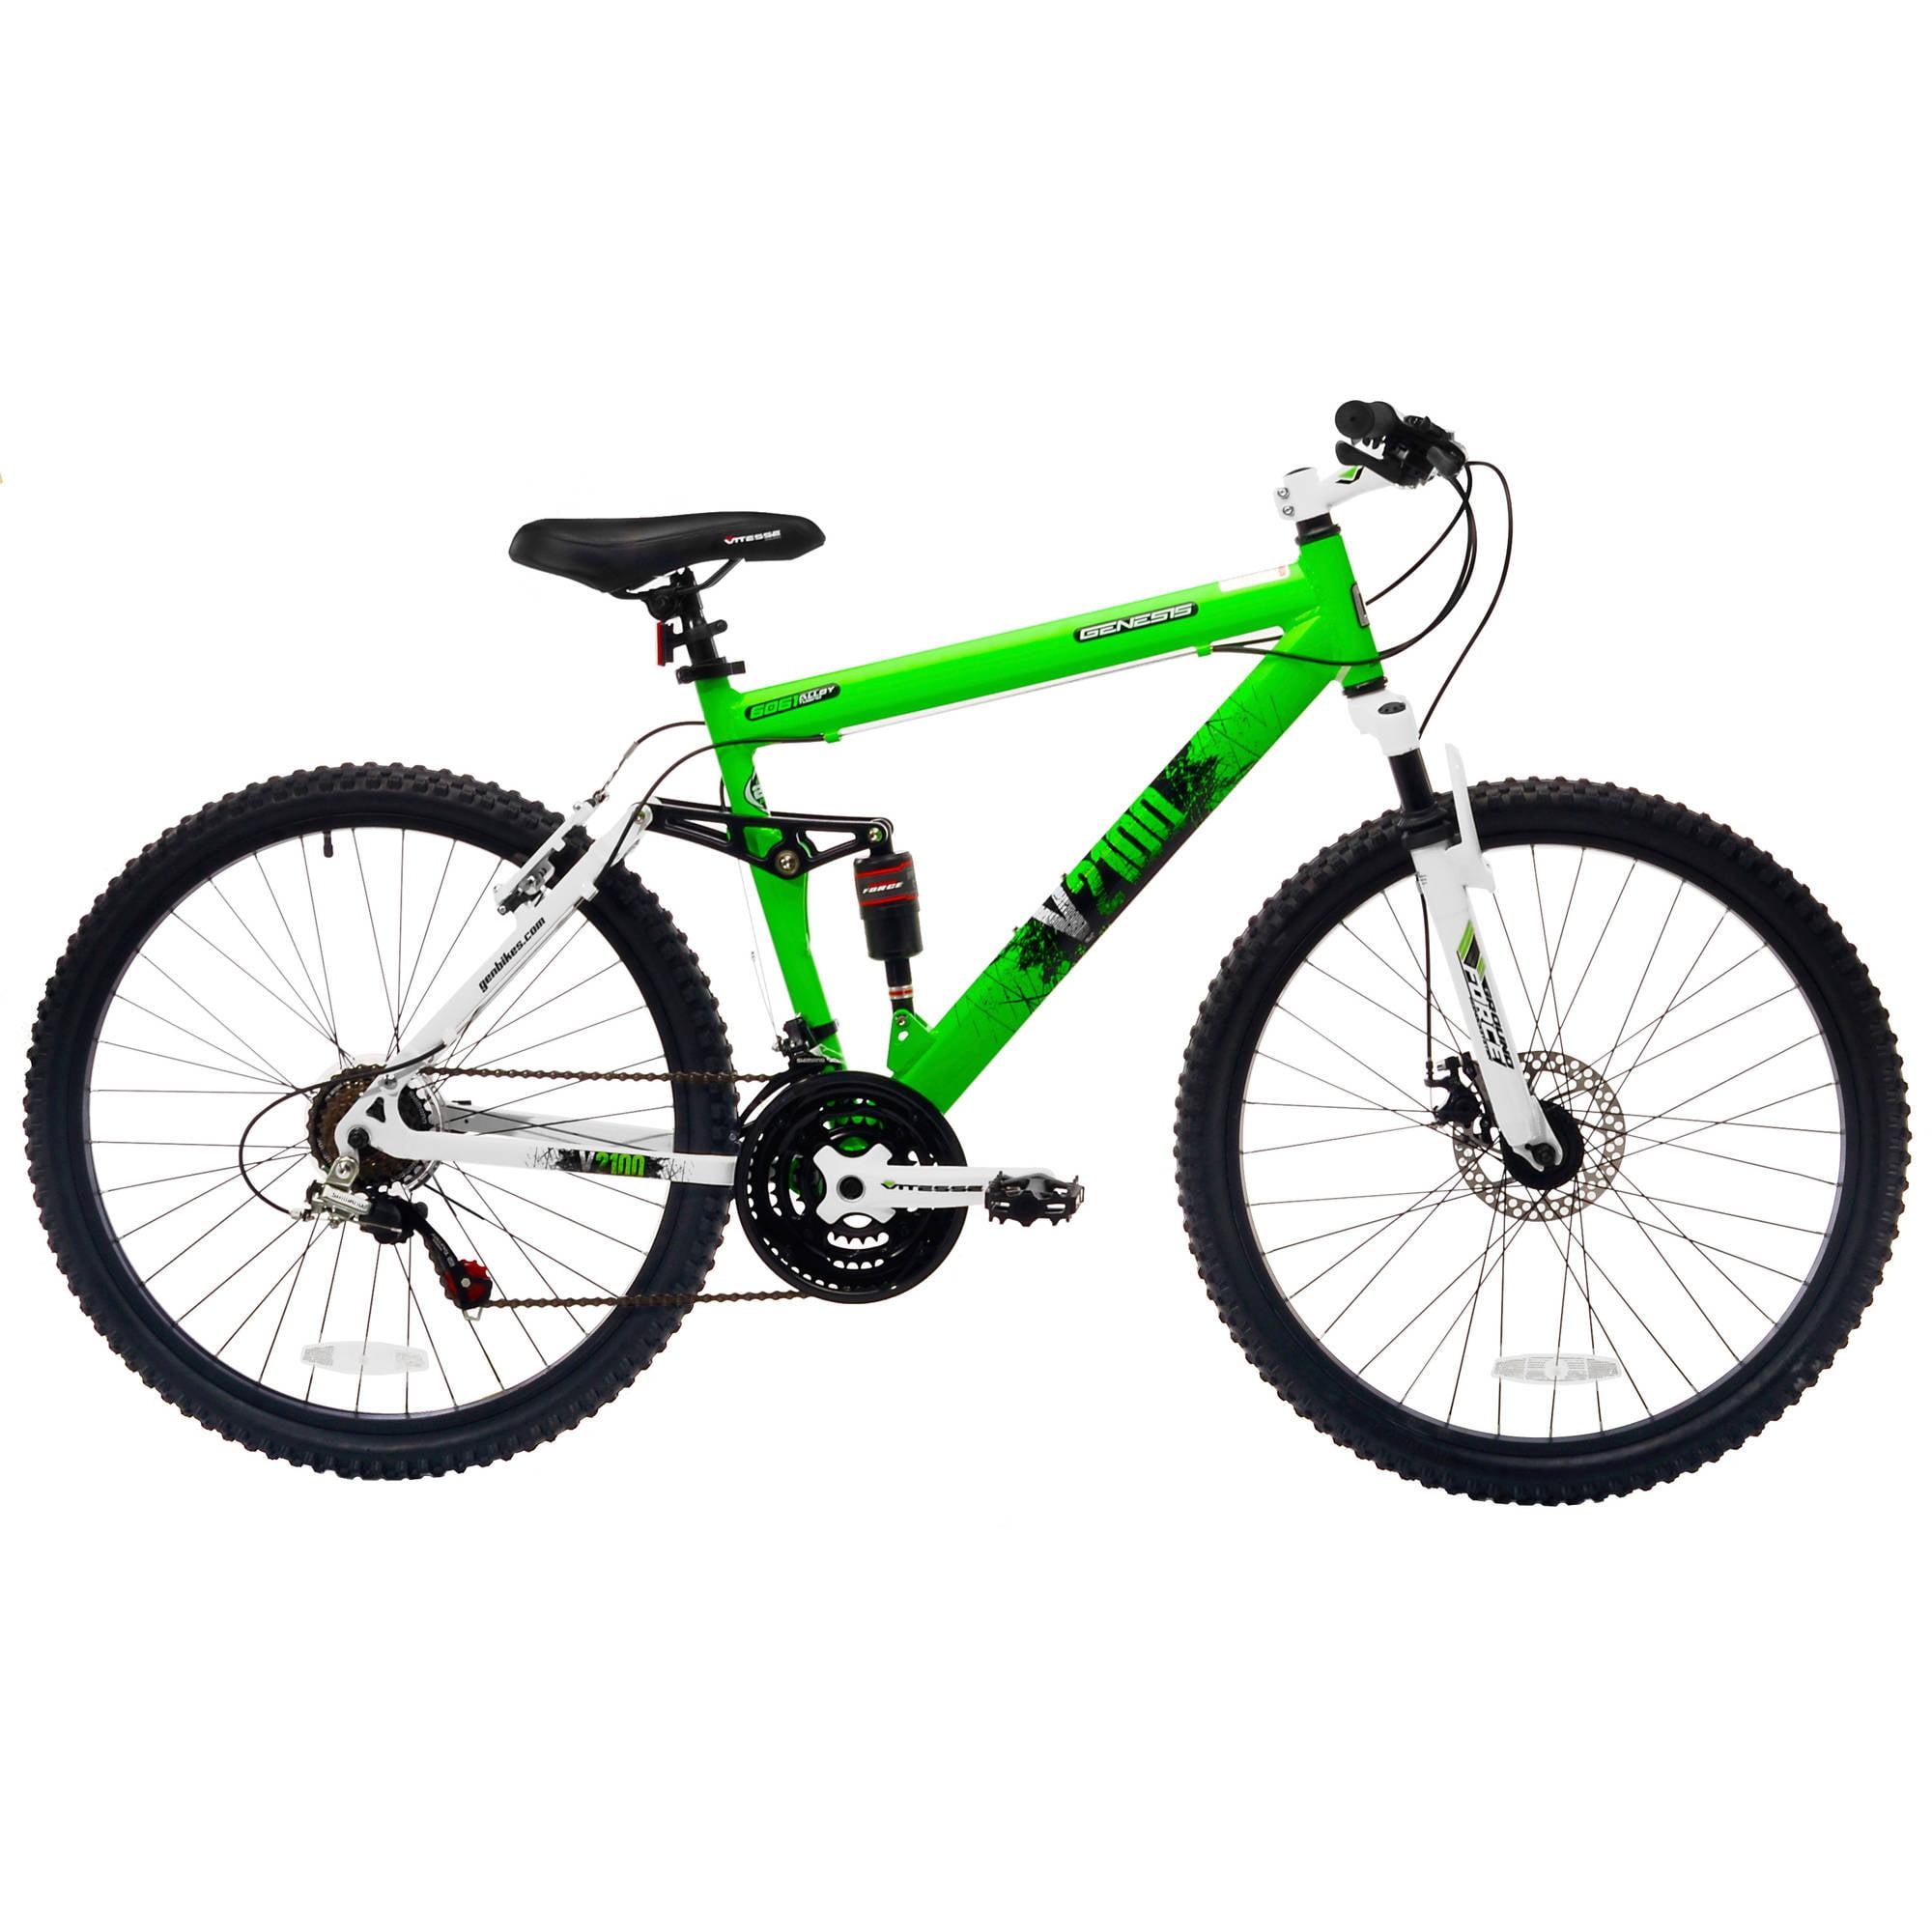 kent 26 men s kzr mountain bike walmart com rh walmart com Mountain Bike Frame Diagram Mountain Bike Crankset Diagram